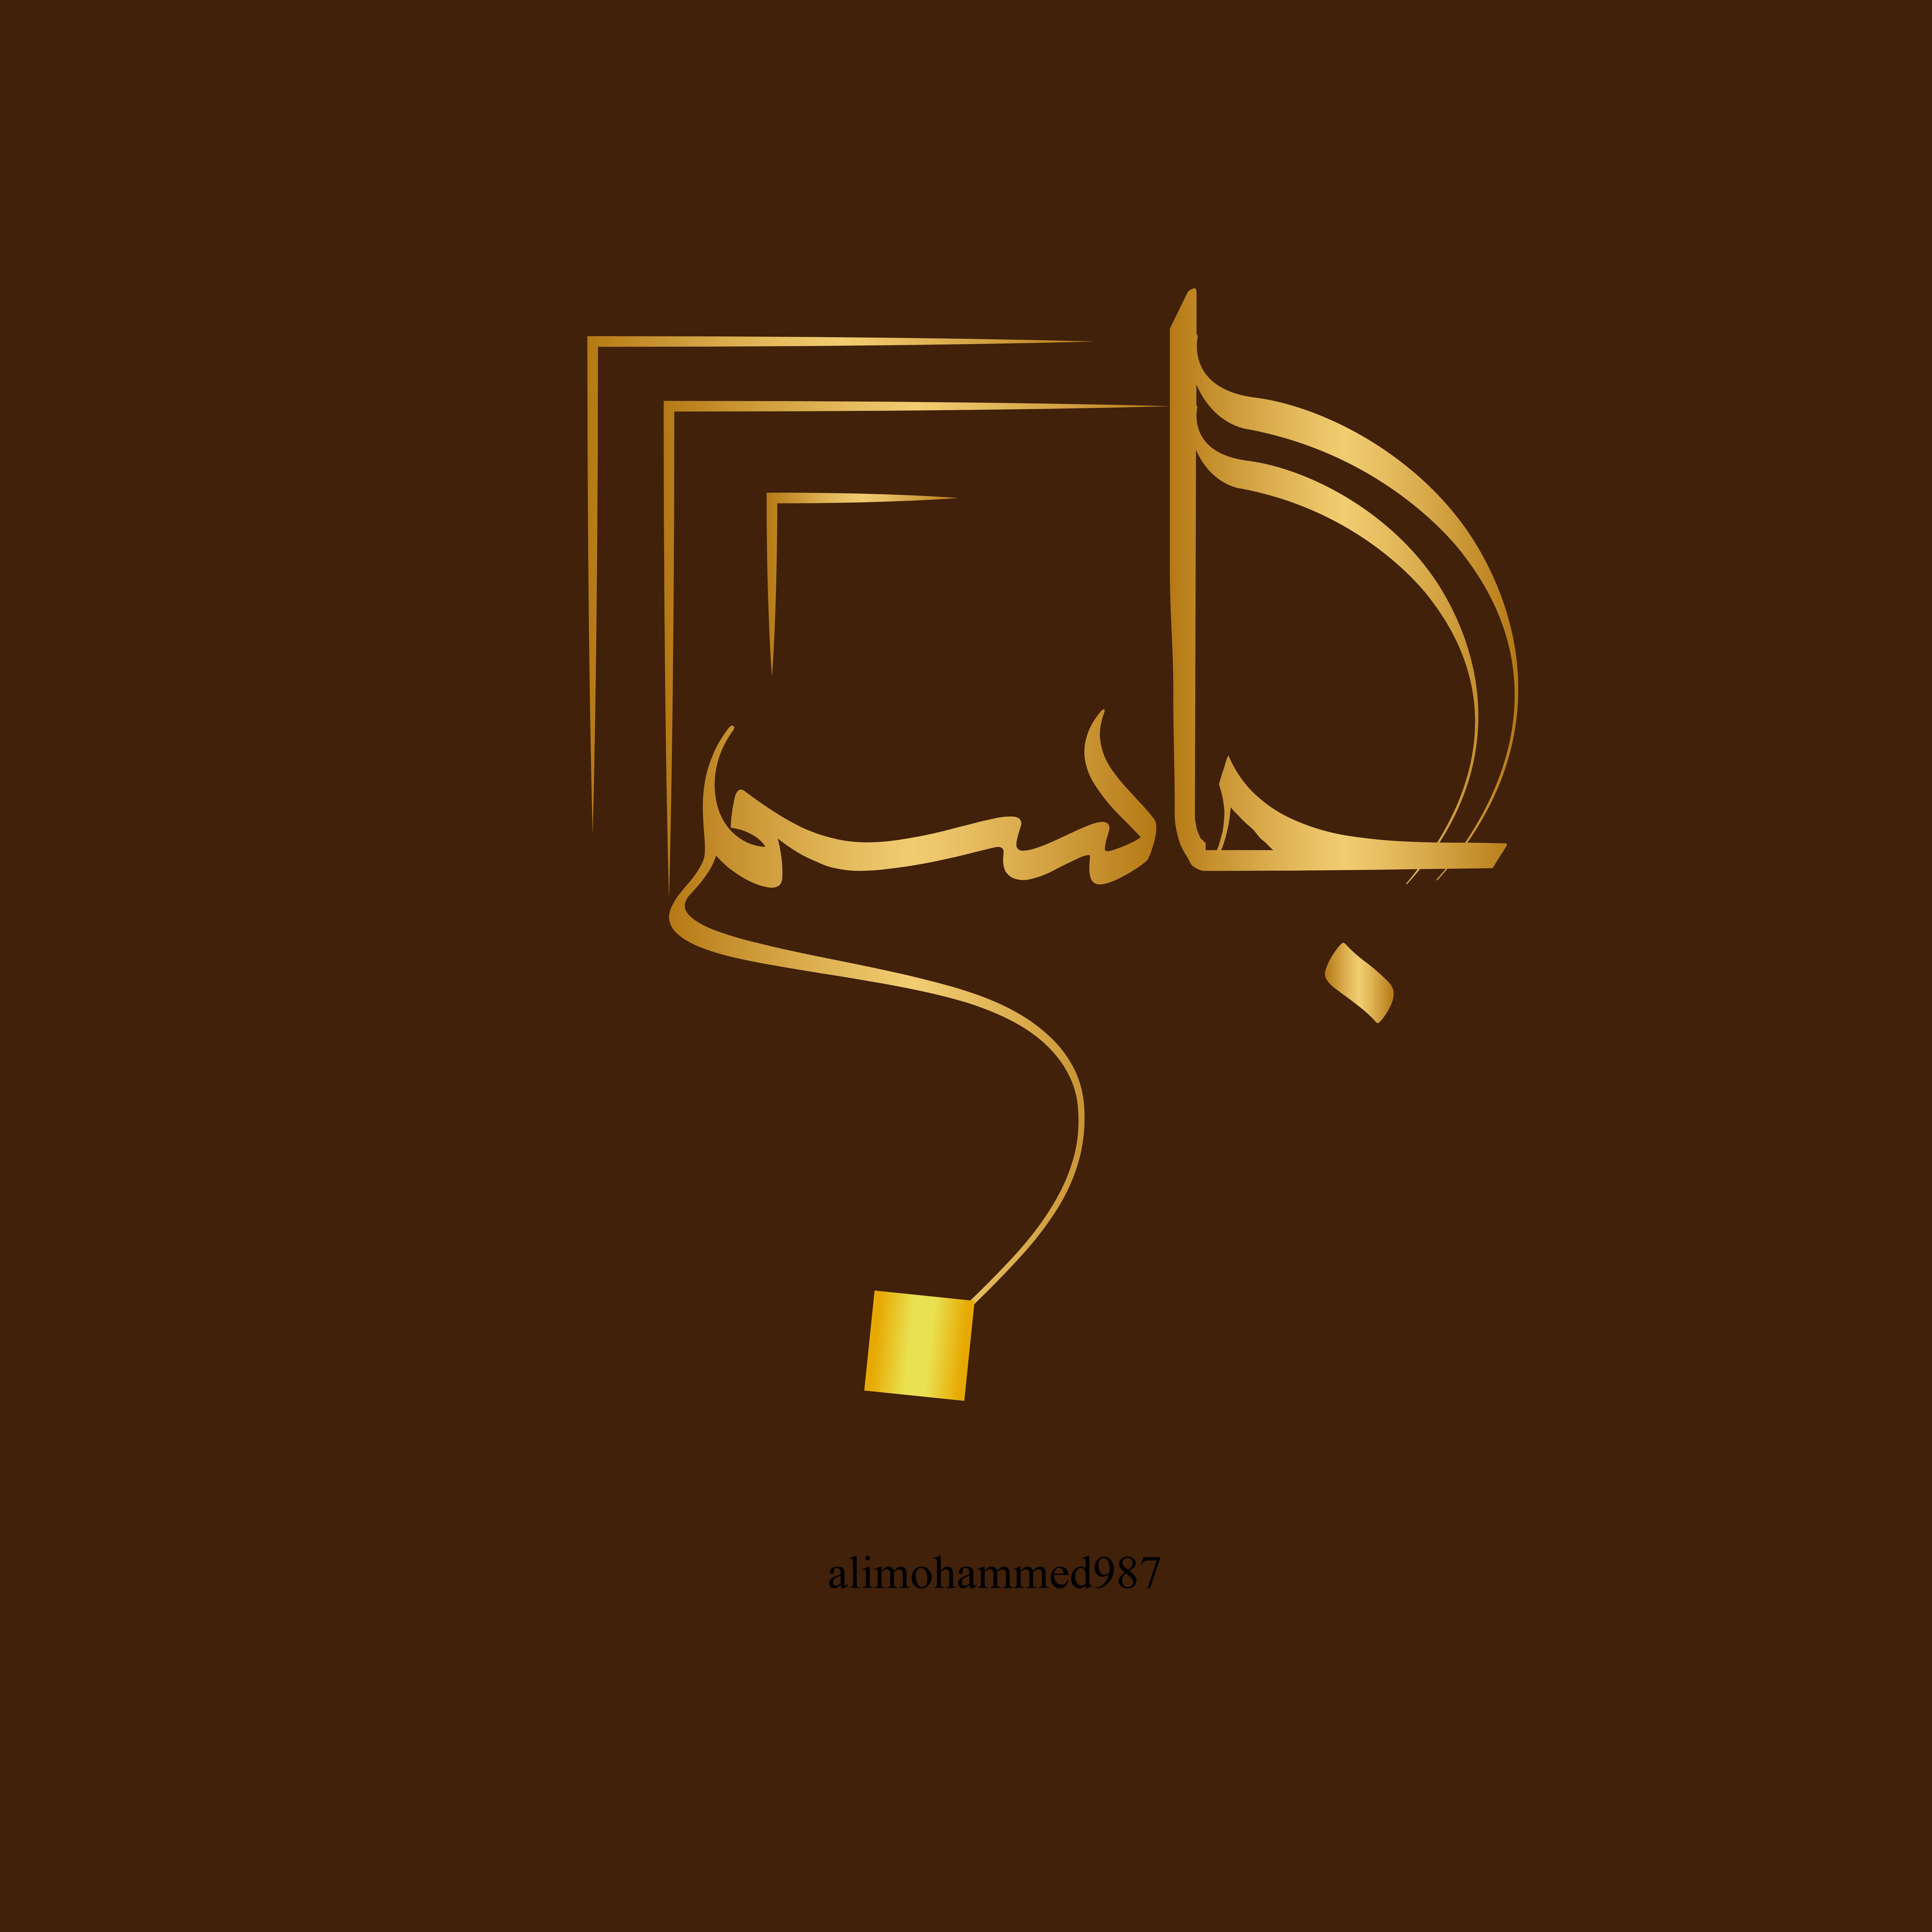 مخطوطة اسم جاسم Sketch Tattoo Design Arabic Calligraphy Art Calligraphy Art